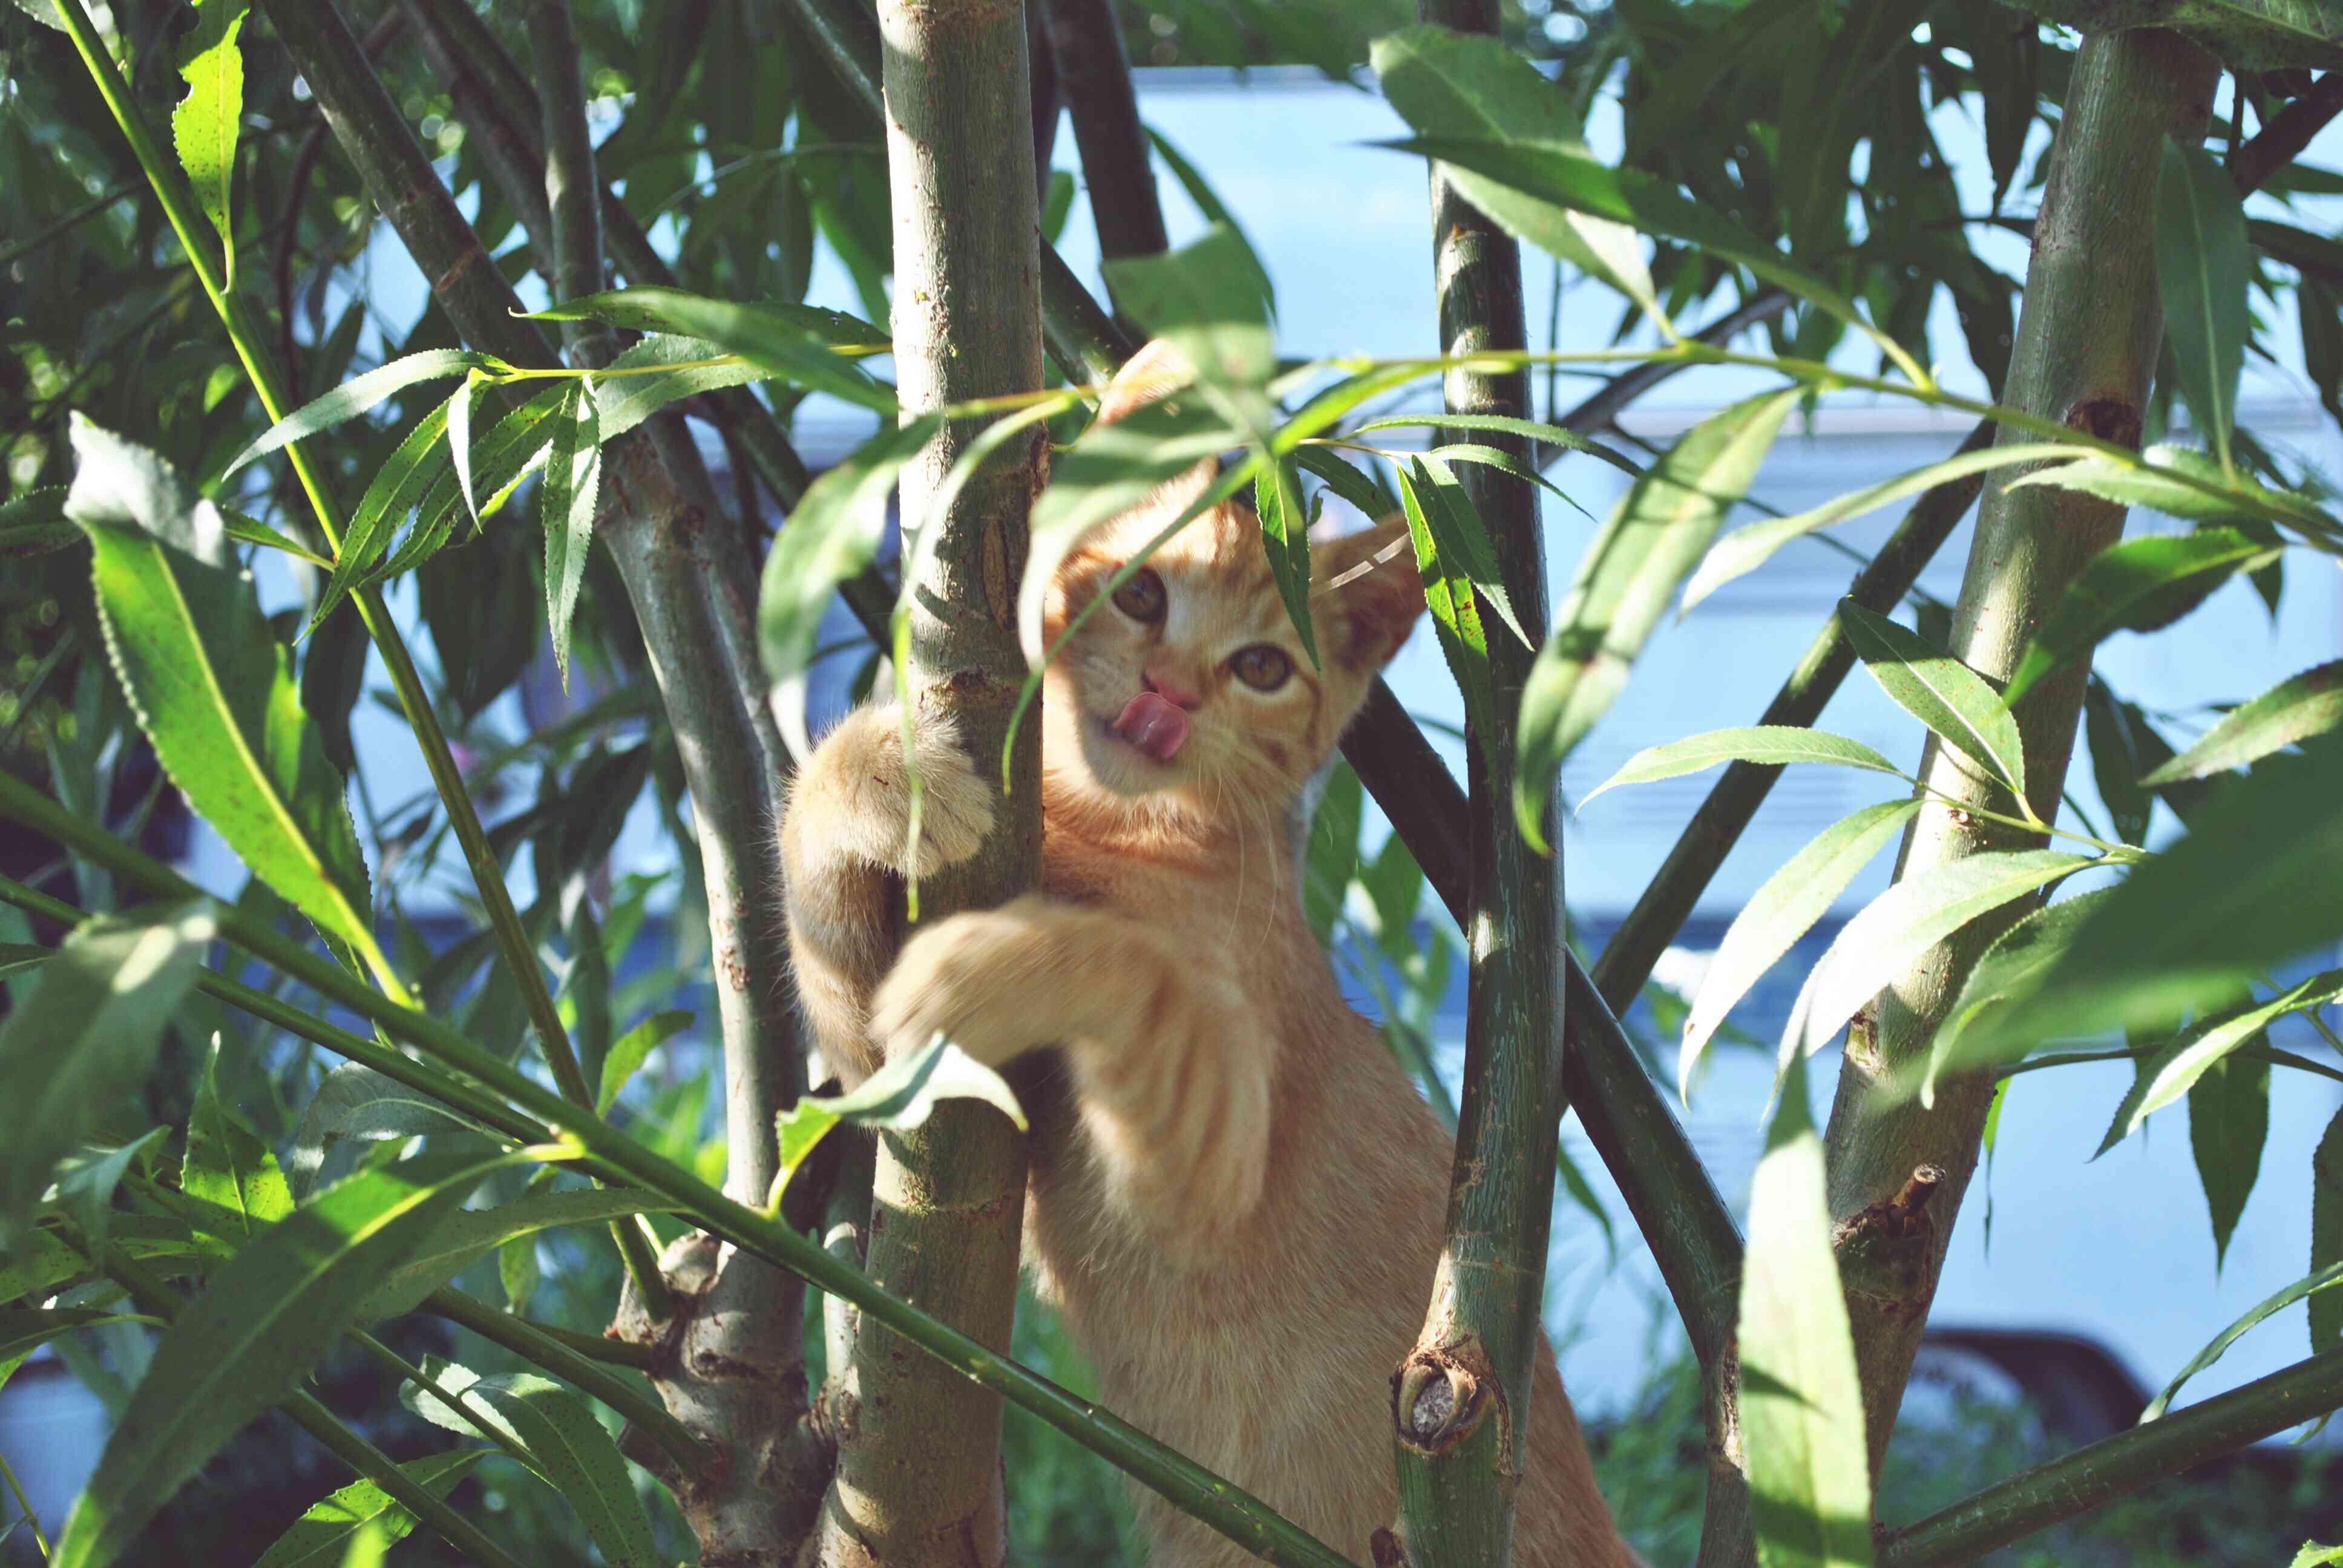 Cat climbing in a tree